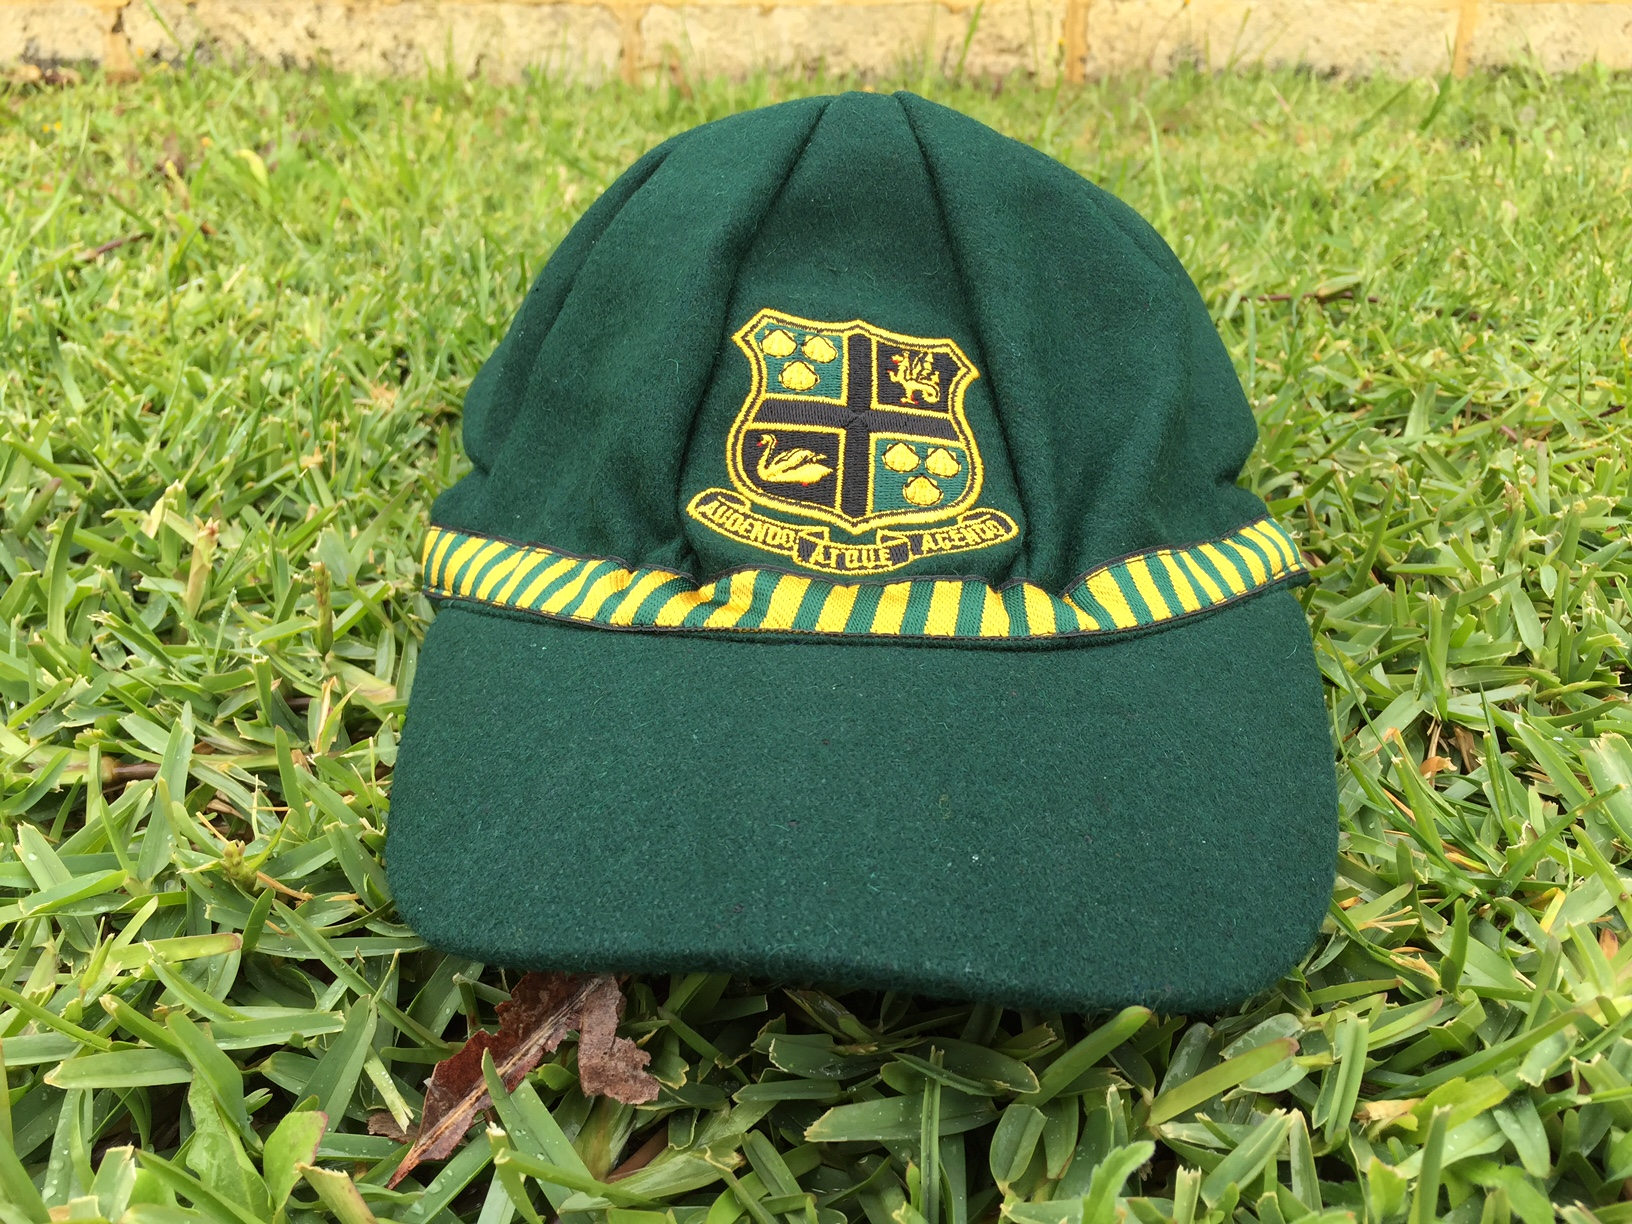 Wesley College 1st 11 Caps